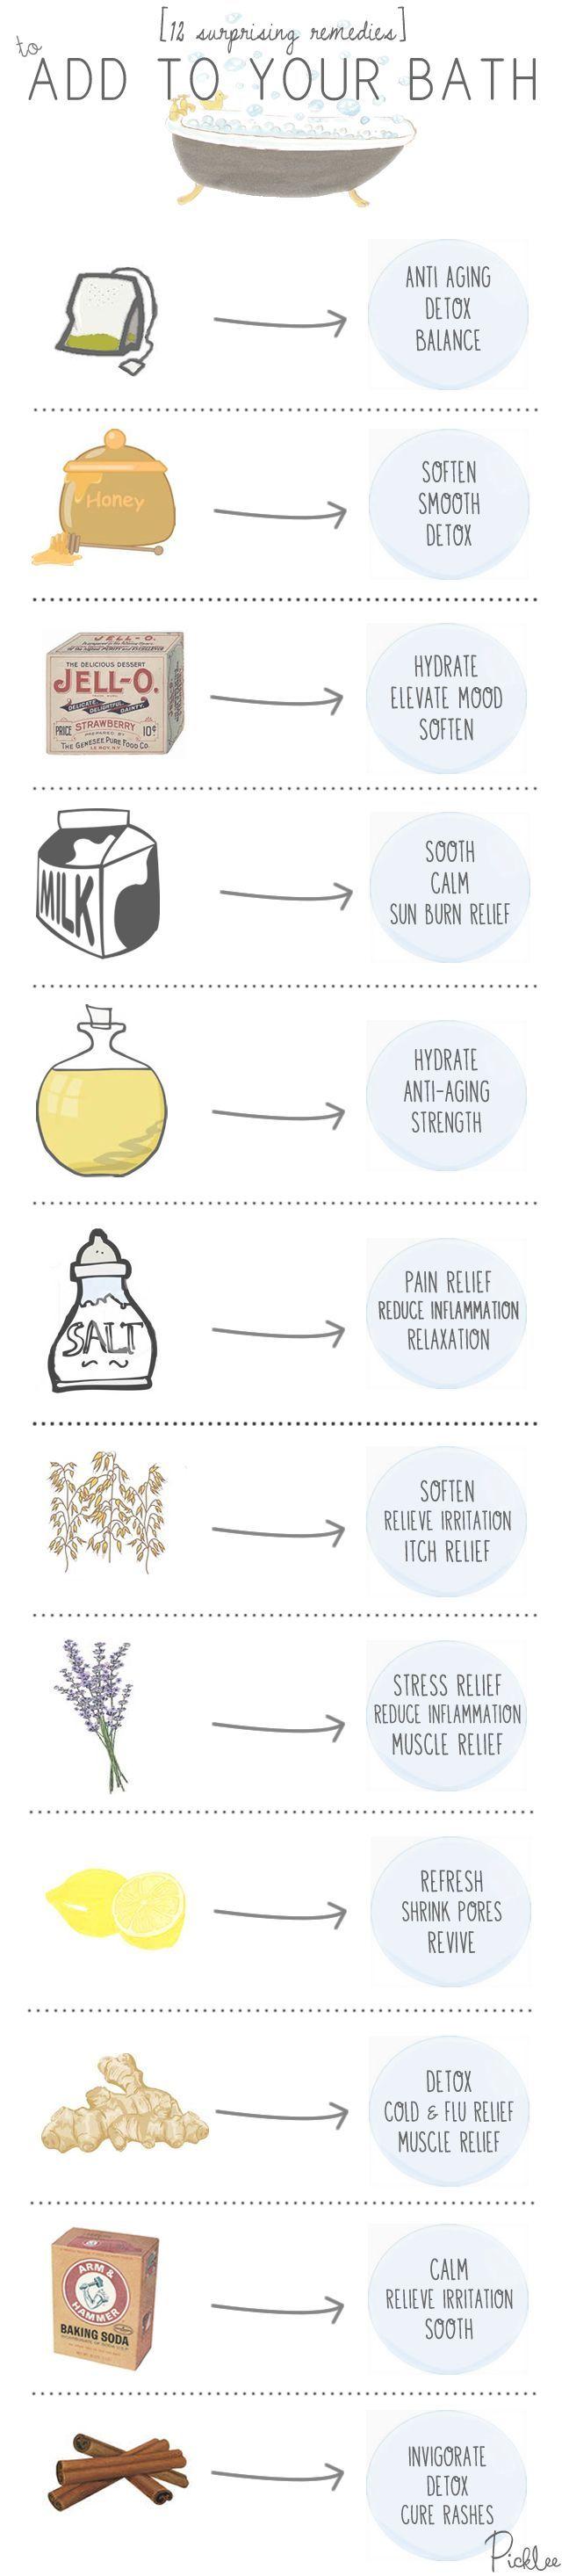 12 Bath Remedies